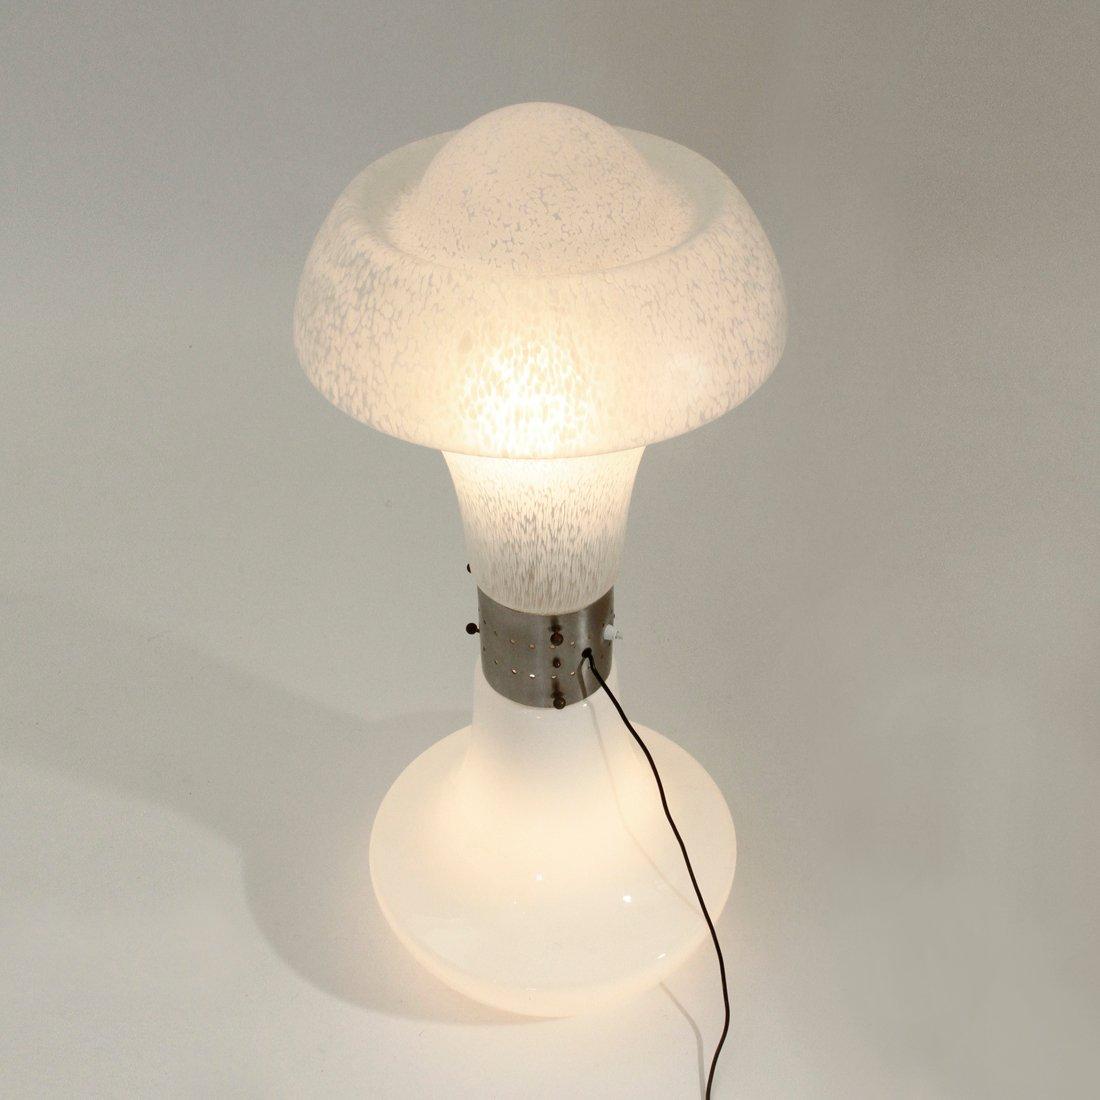 vintage murano glass floor lamp by carlo nason for mazzega. Black Bedroom Furniture Sets. Home Design Ideas